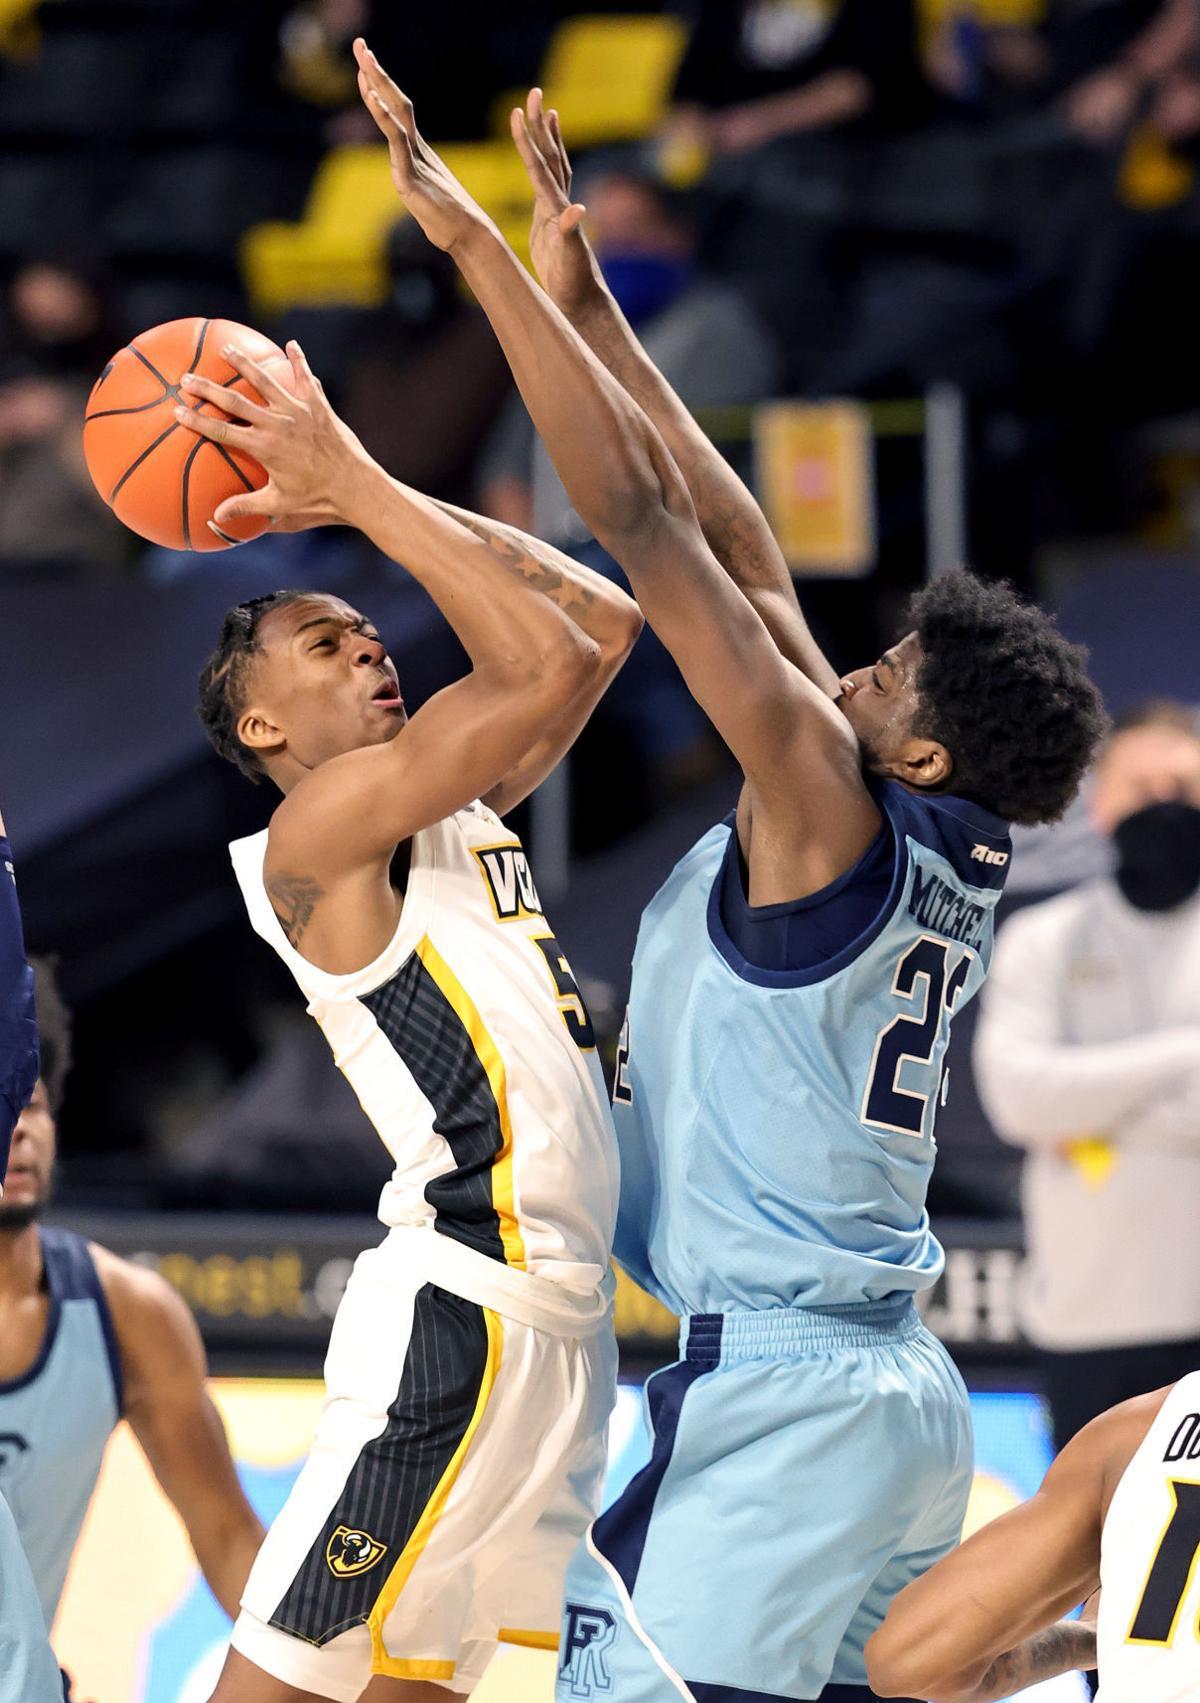 VCU men's basketball game vs. Rhode Island